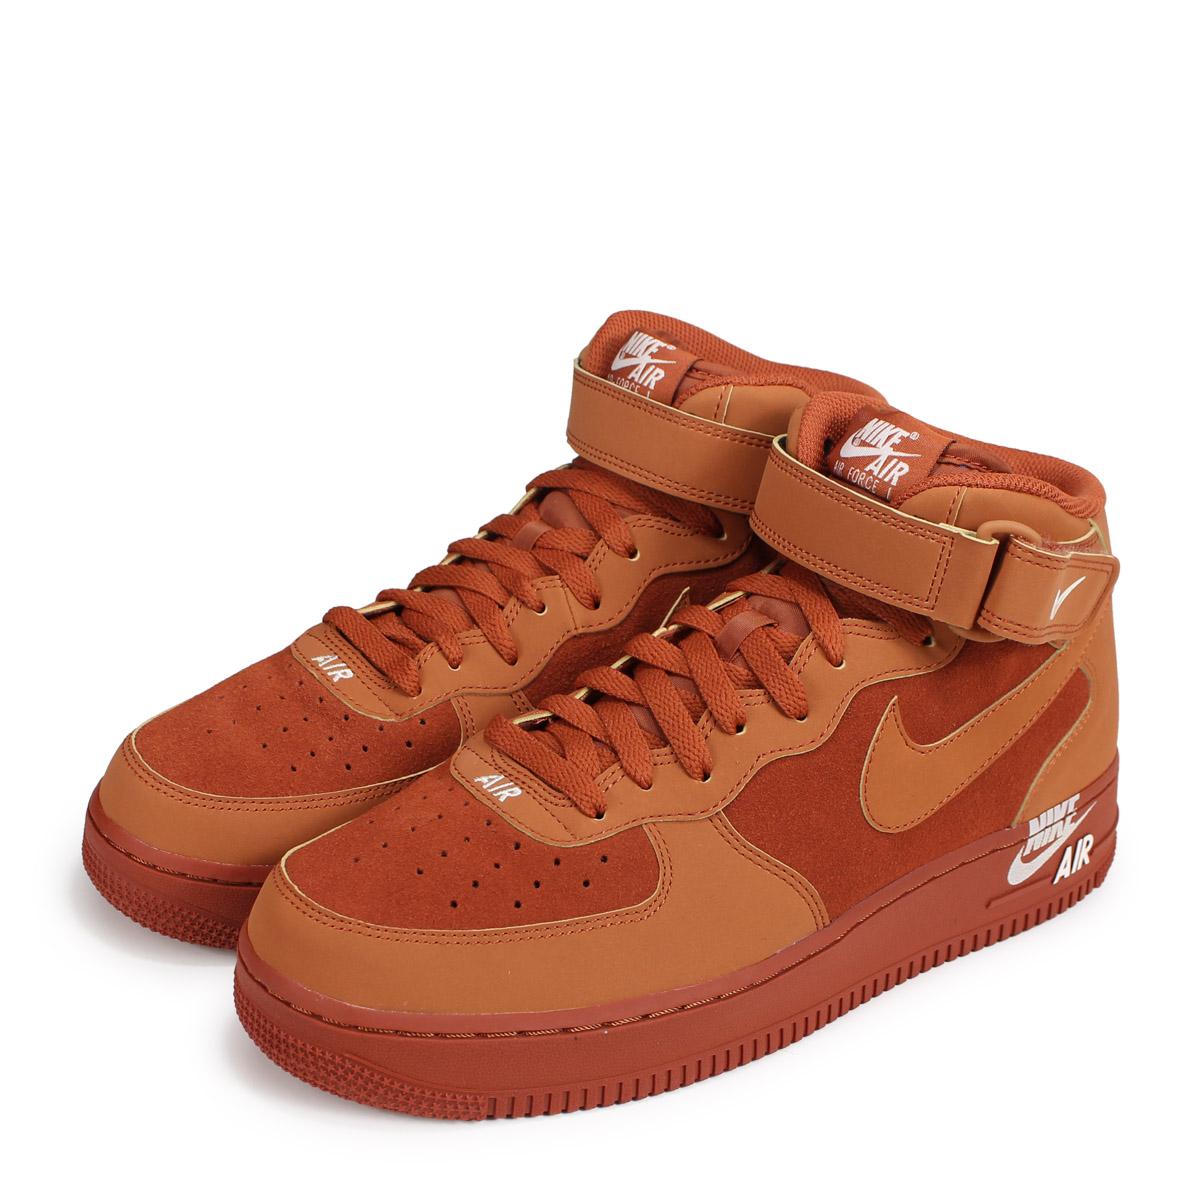 Nike NIKE air force 1 sneakers men AIR FORCE 1 MID 07 315,123 207 brown